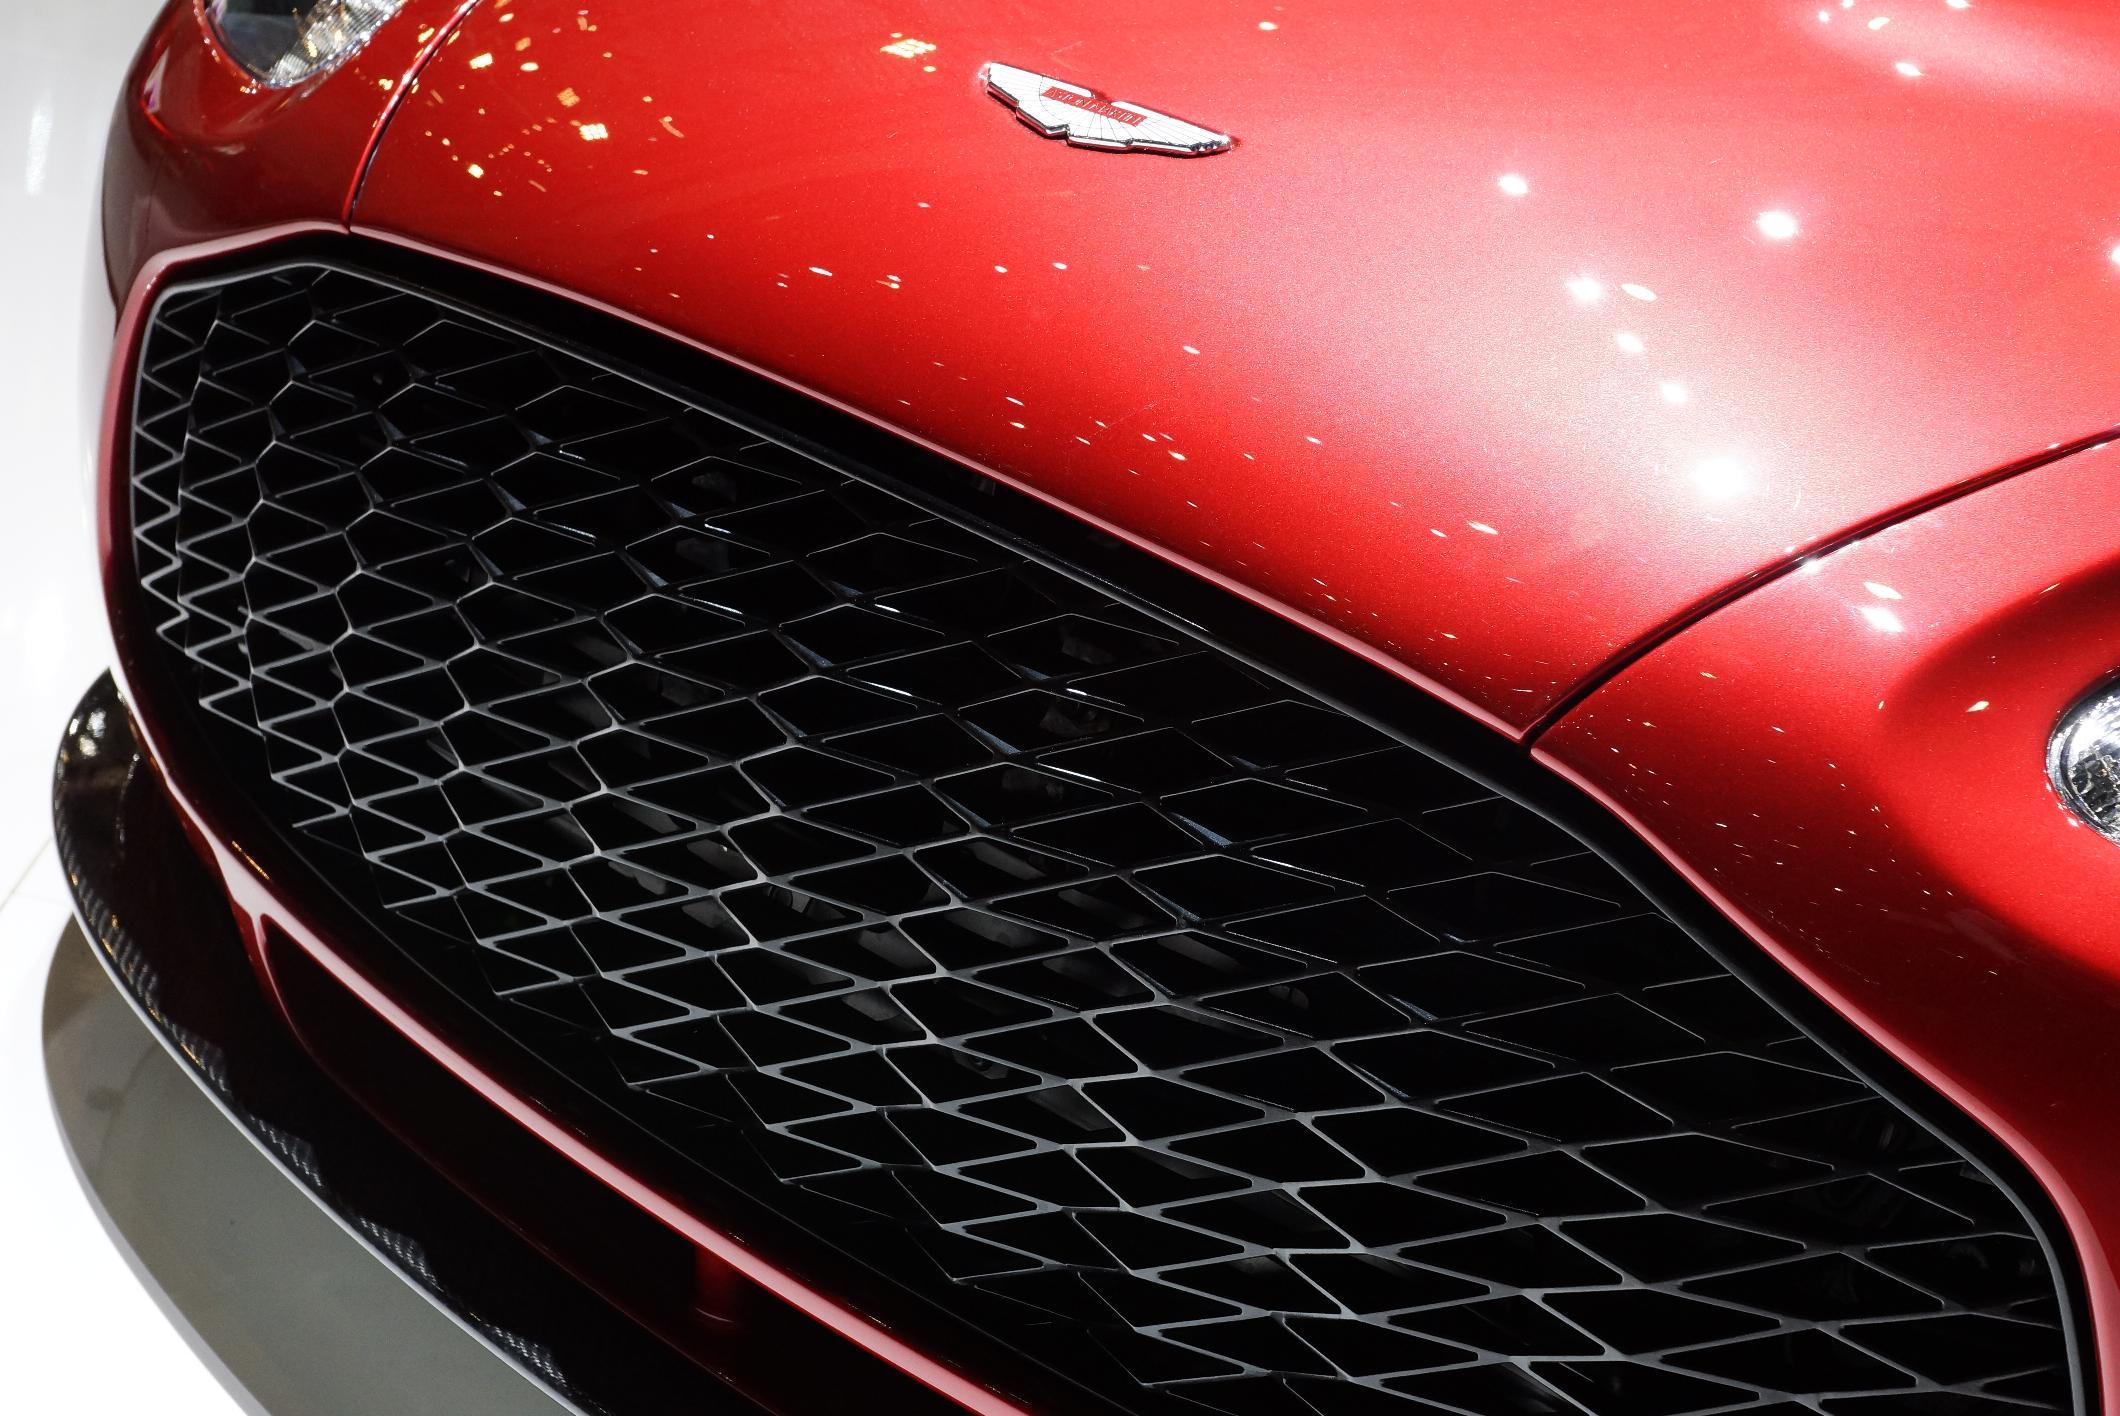 Aston Martin V12 Zagato Geneva 2012 Grille